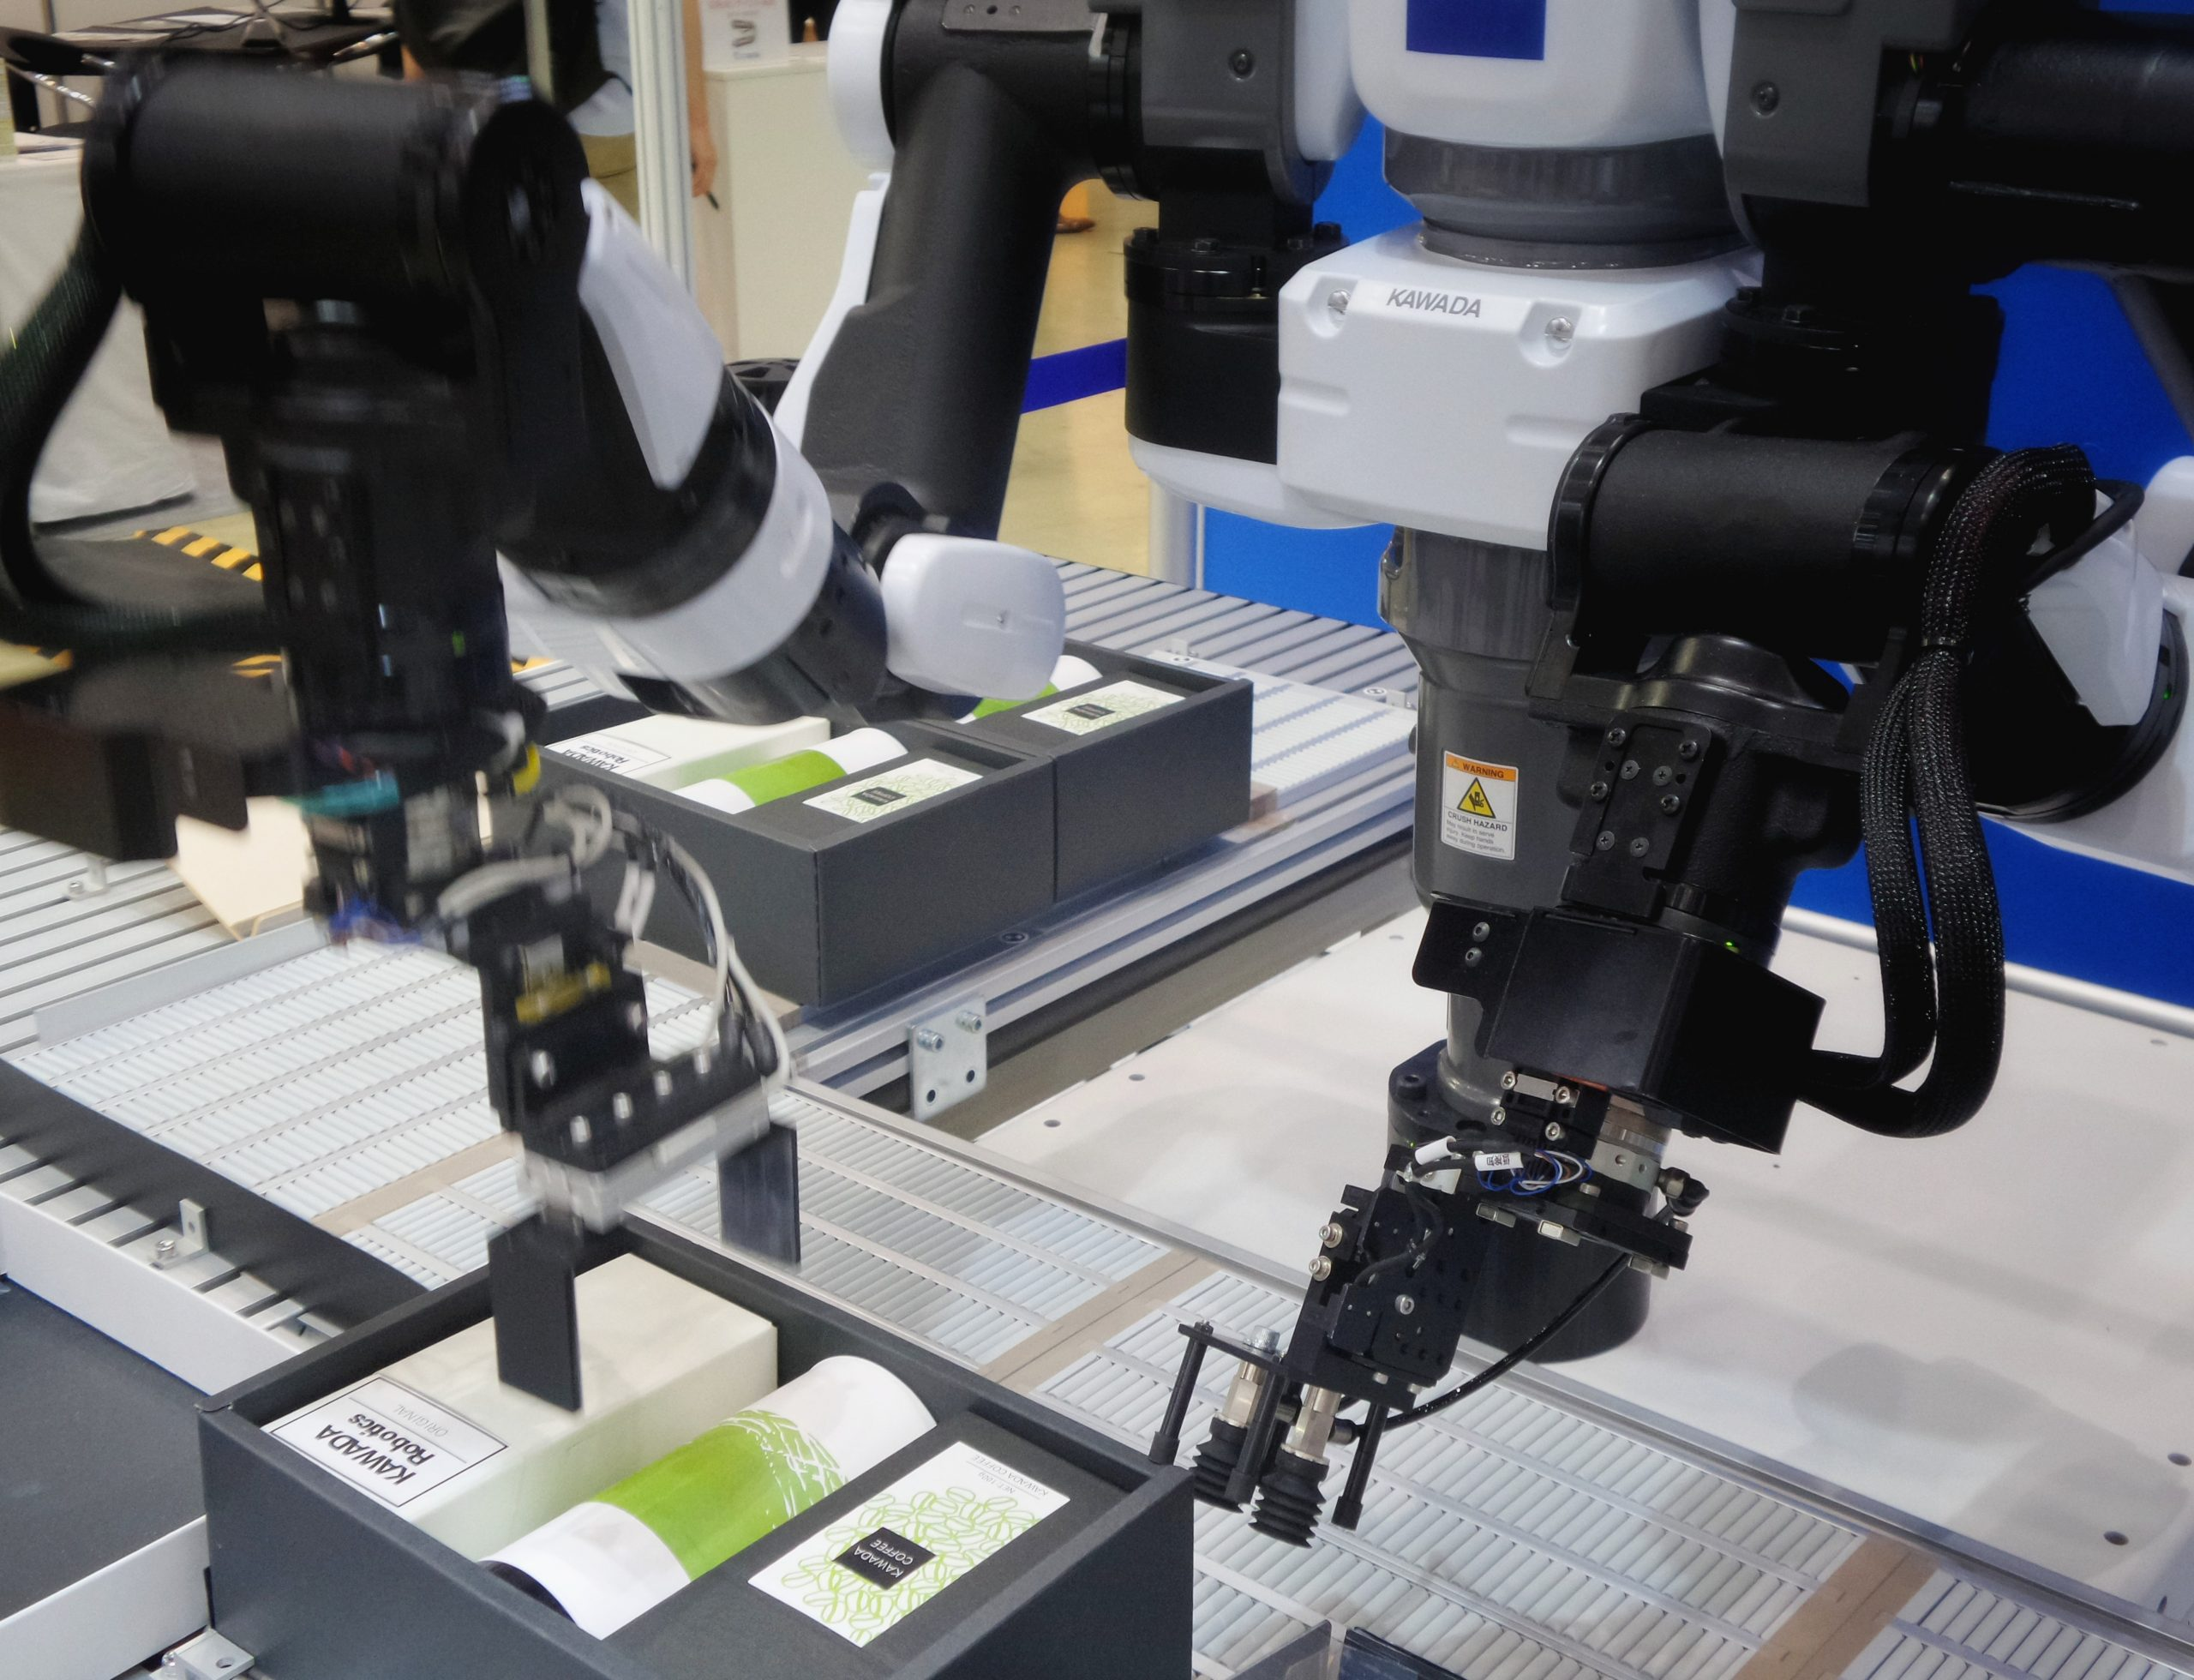 Robotoké a jövő?